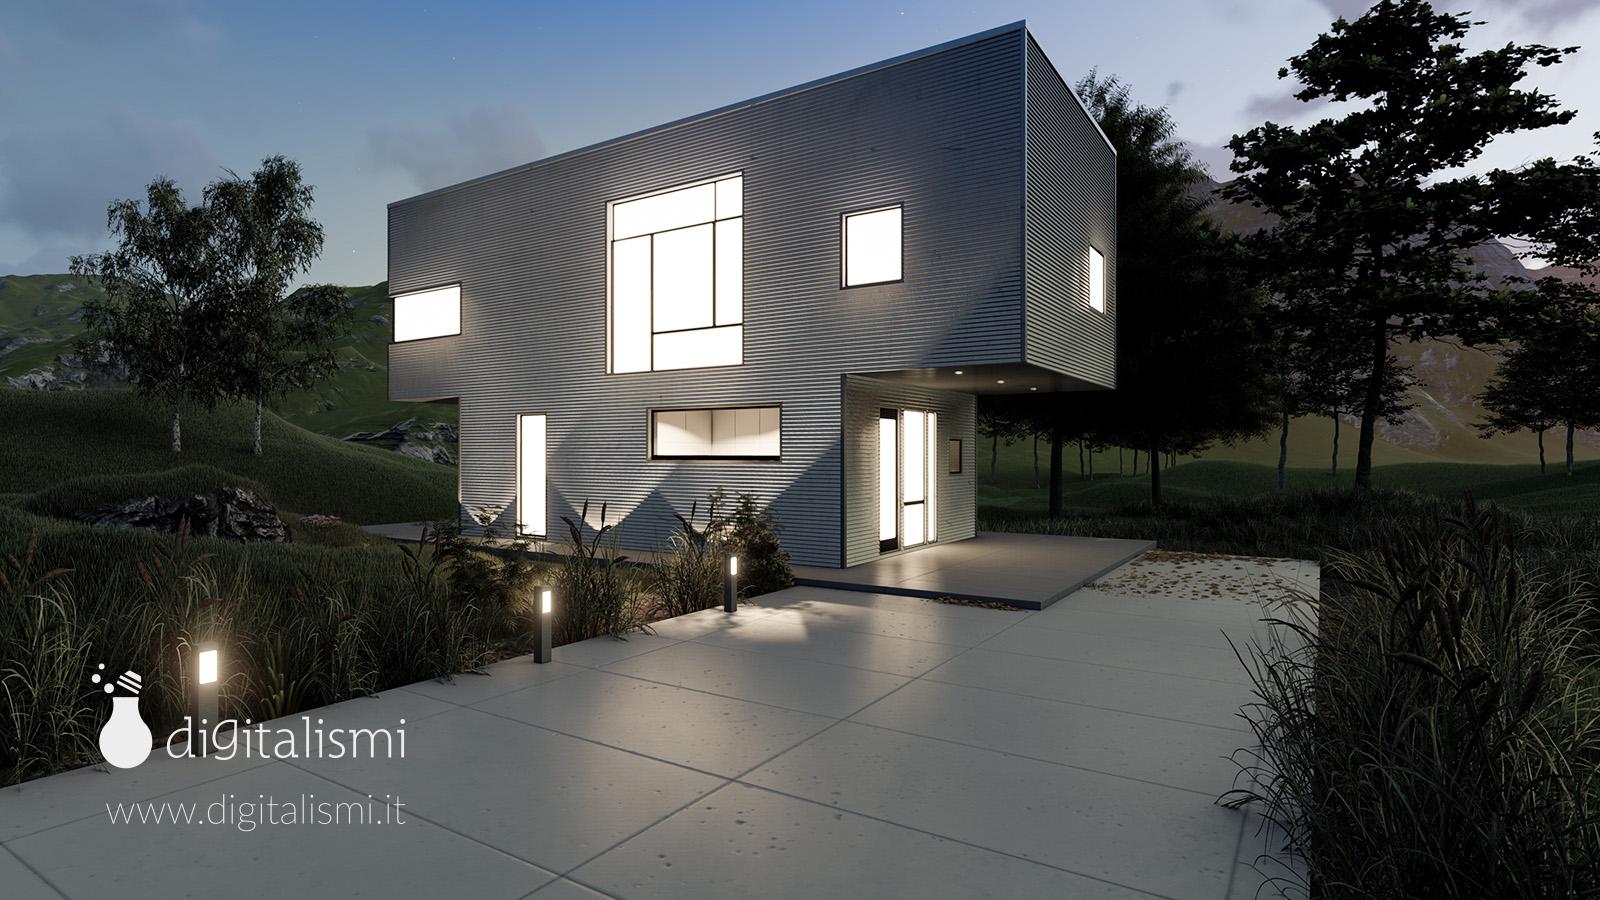 rendering 3d architettura esterni illuminazione notturna